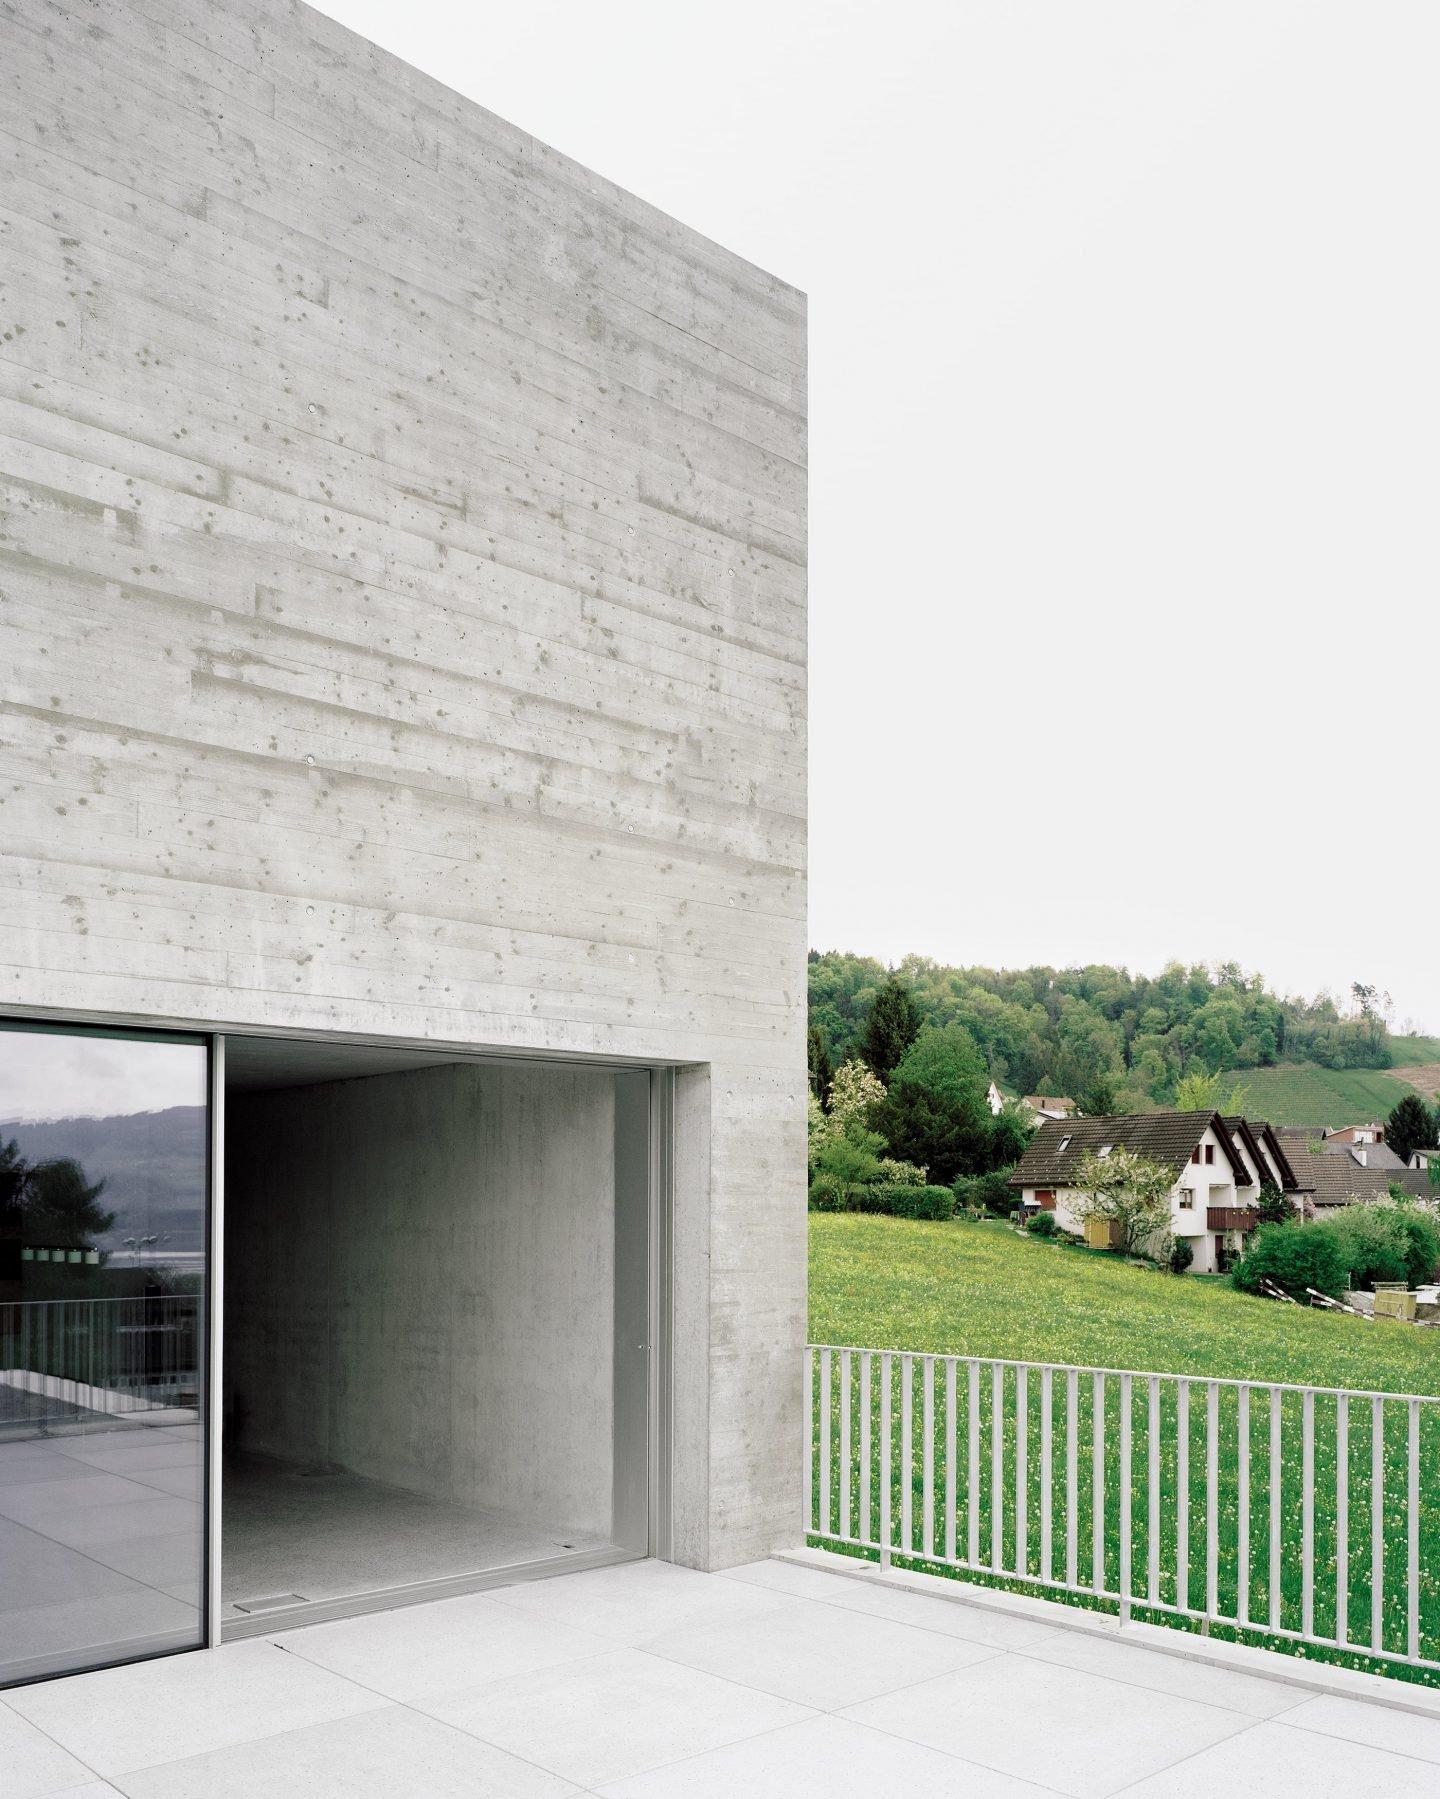 IGNANT-Architeecture-HouseB-3-min